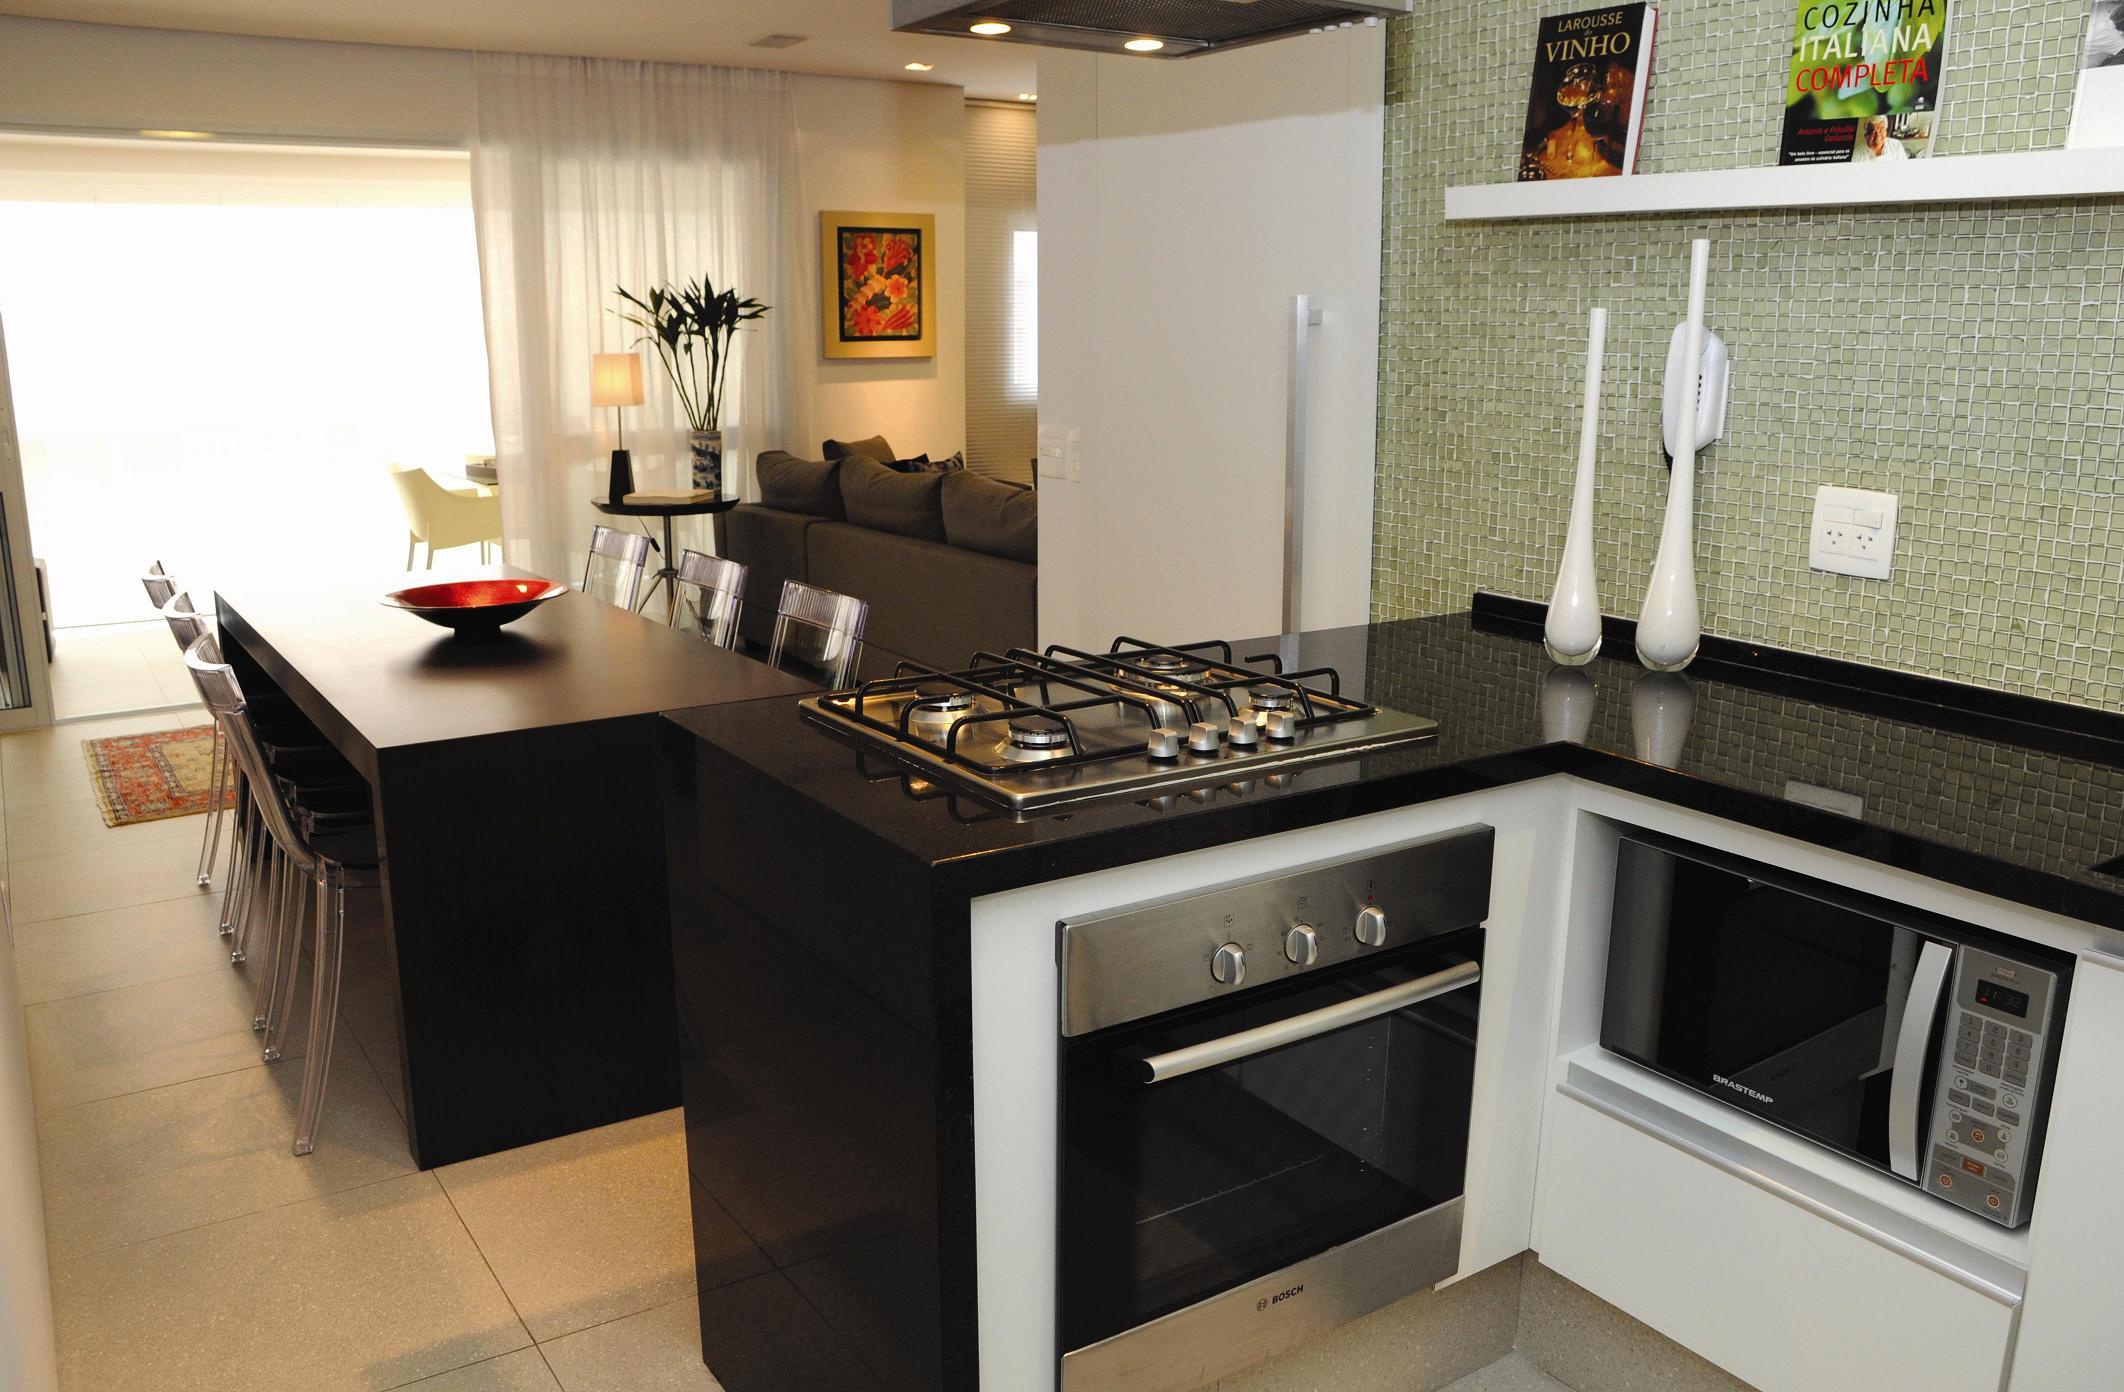 cozinha sala #B72A14 2124 1392